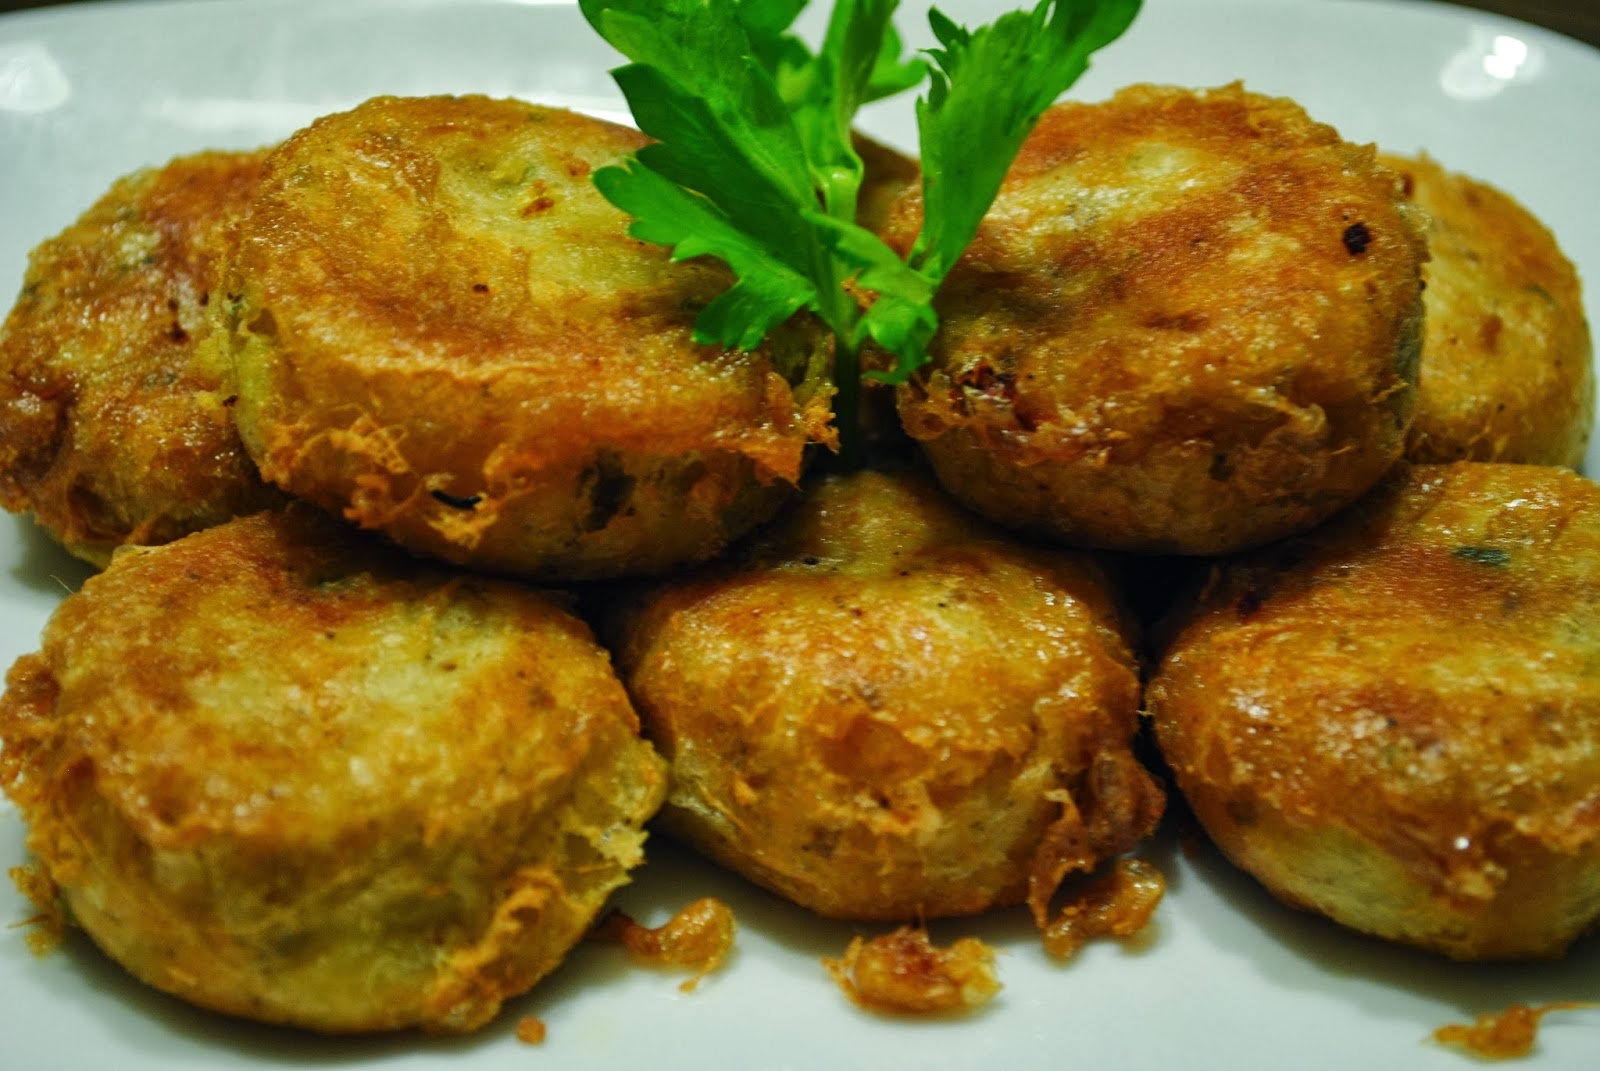 Resep Masakan Perkedel Kentang kombinasi daging empuk enak